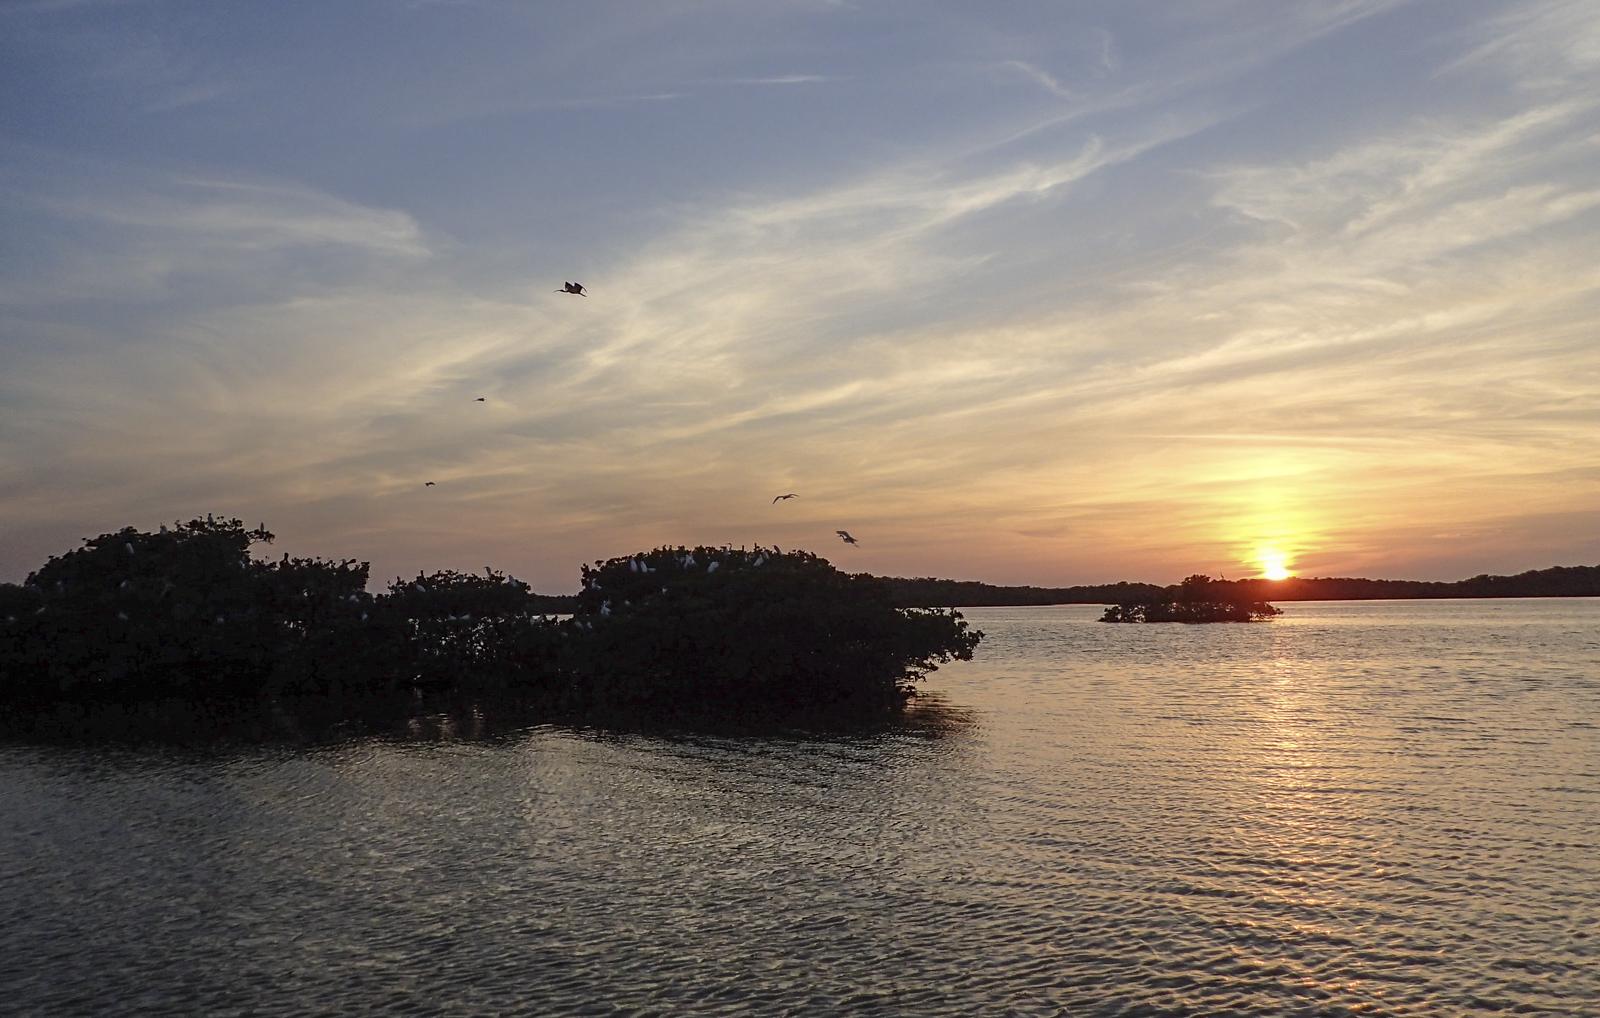 magrove island sunset